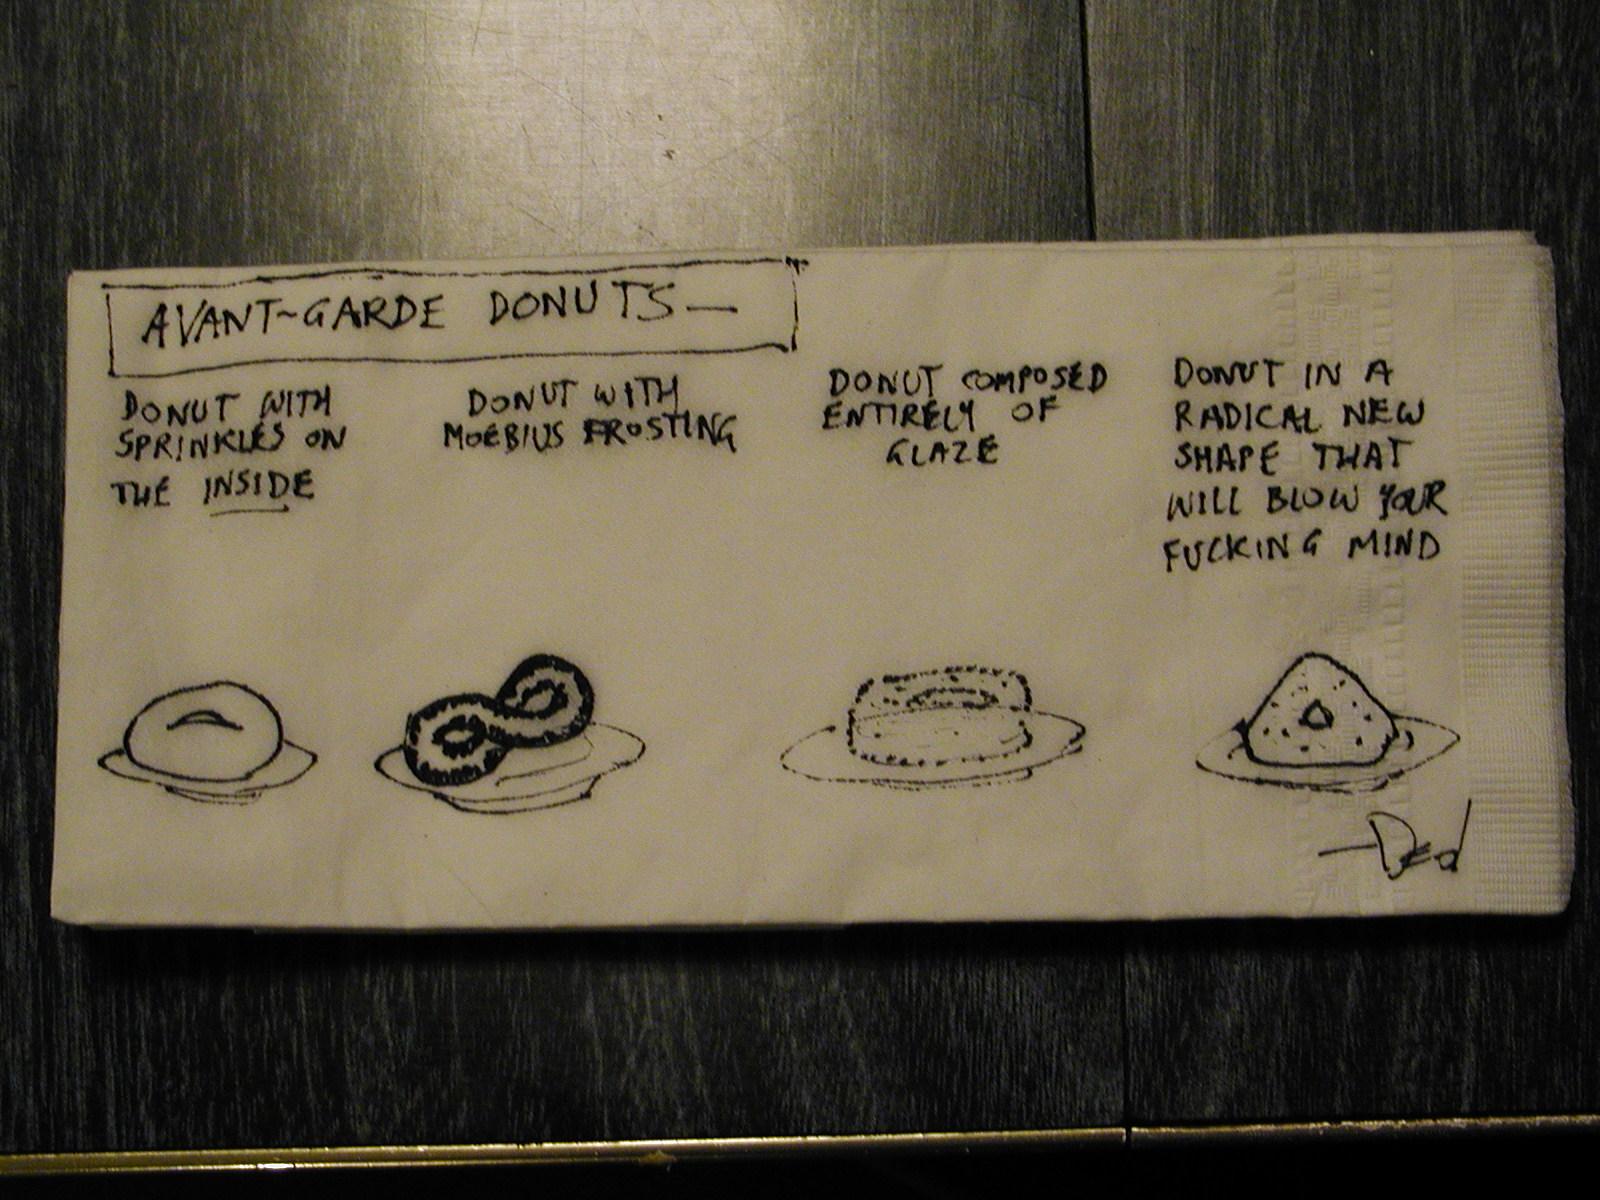 [avant+garde+donuts]